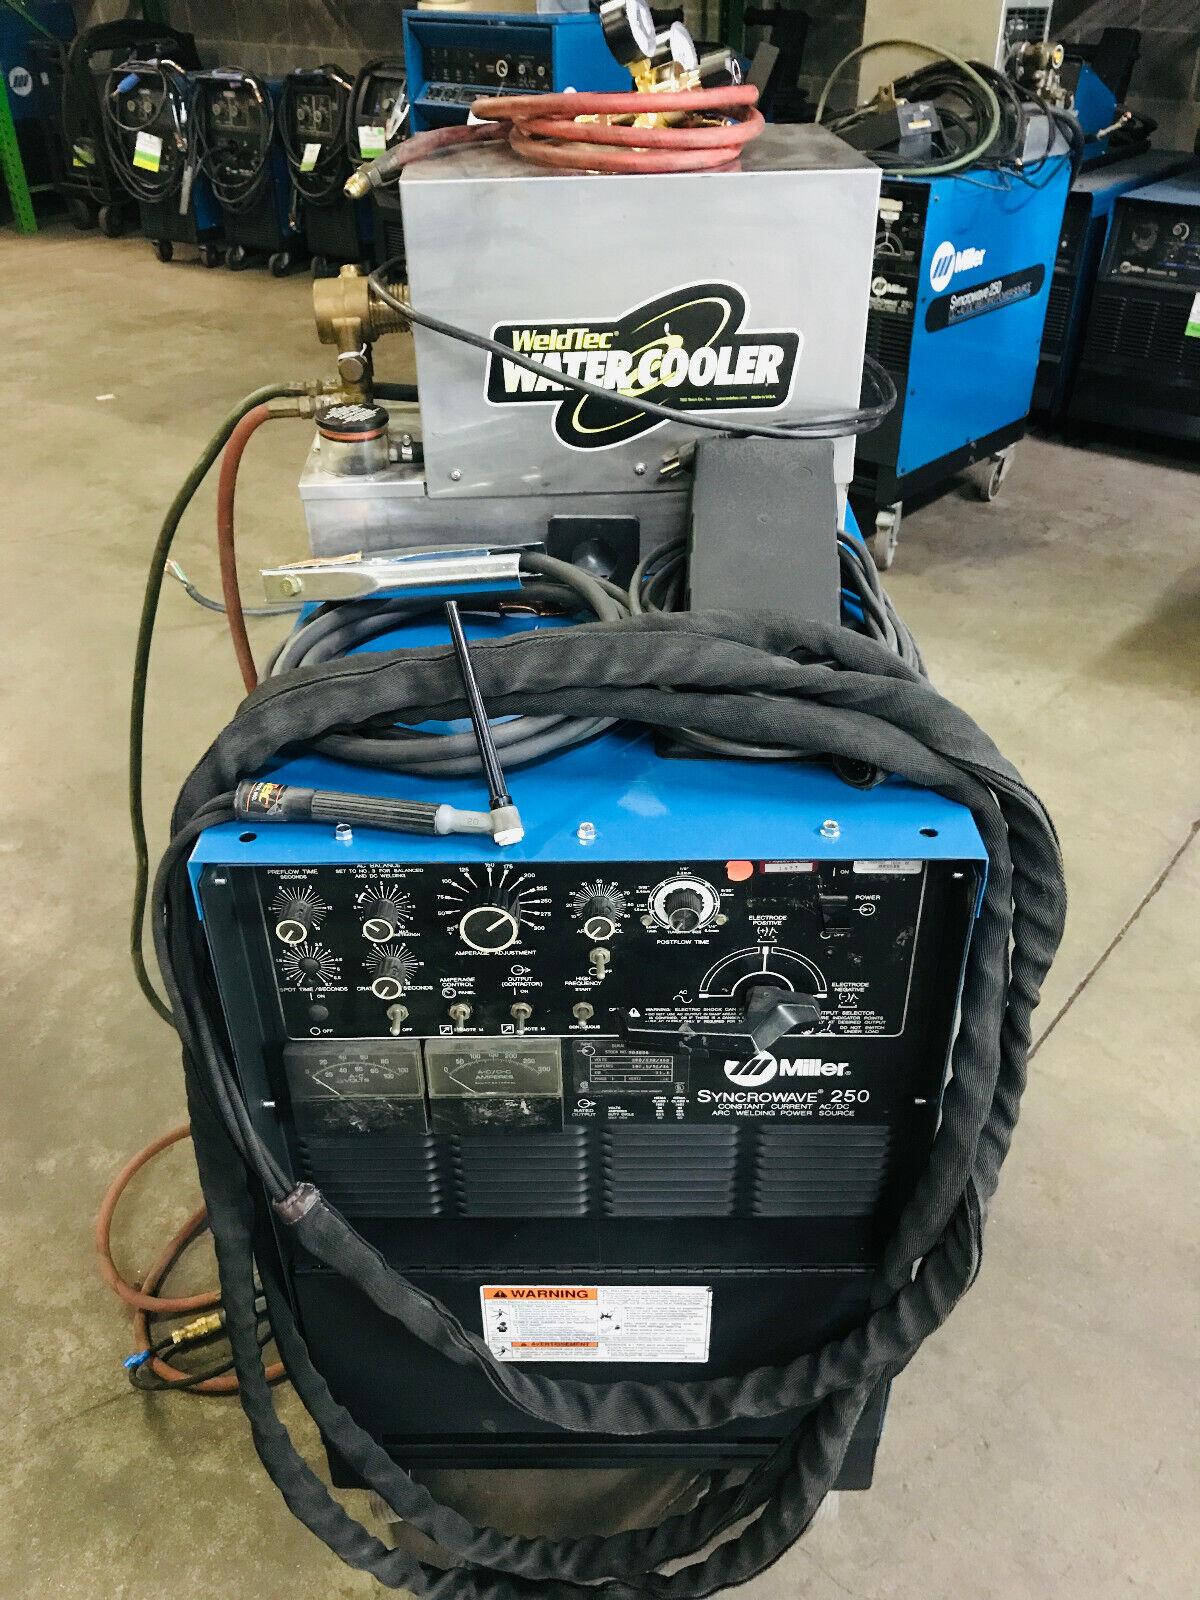 Miller Syncrowave 250 TIG Welder on Cart. Buy it now for 2995.00